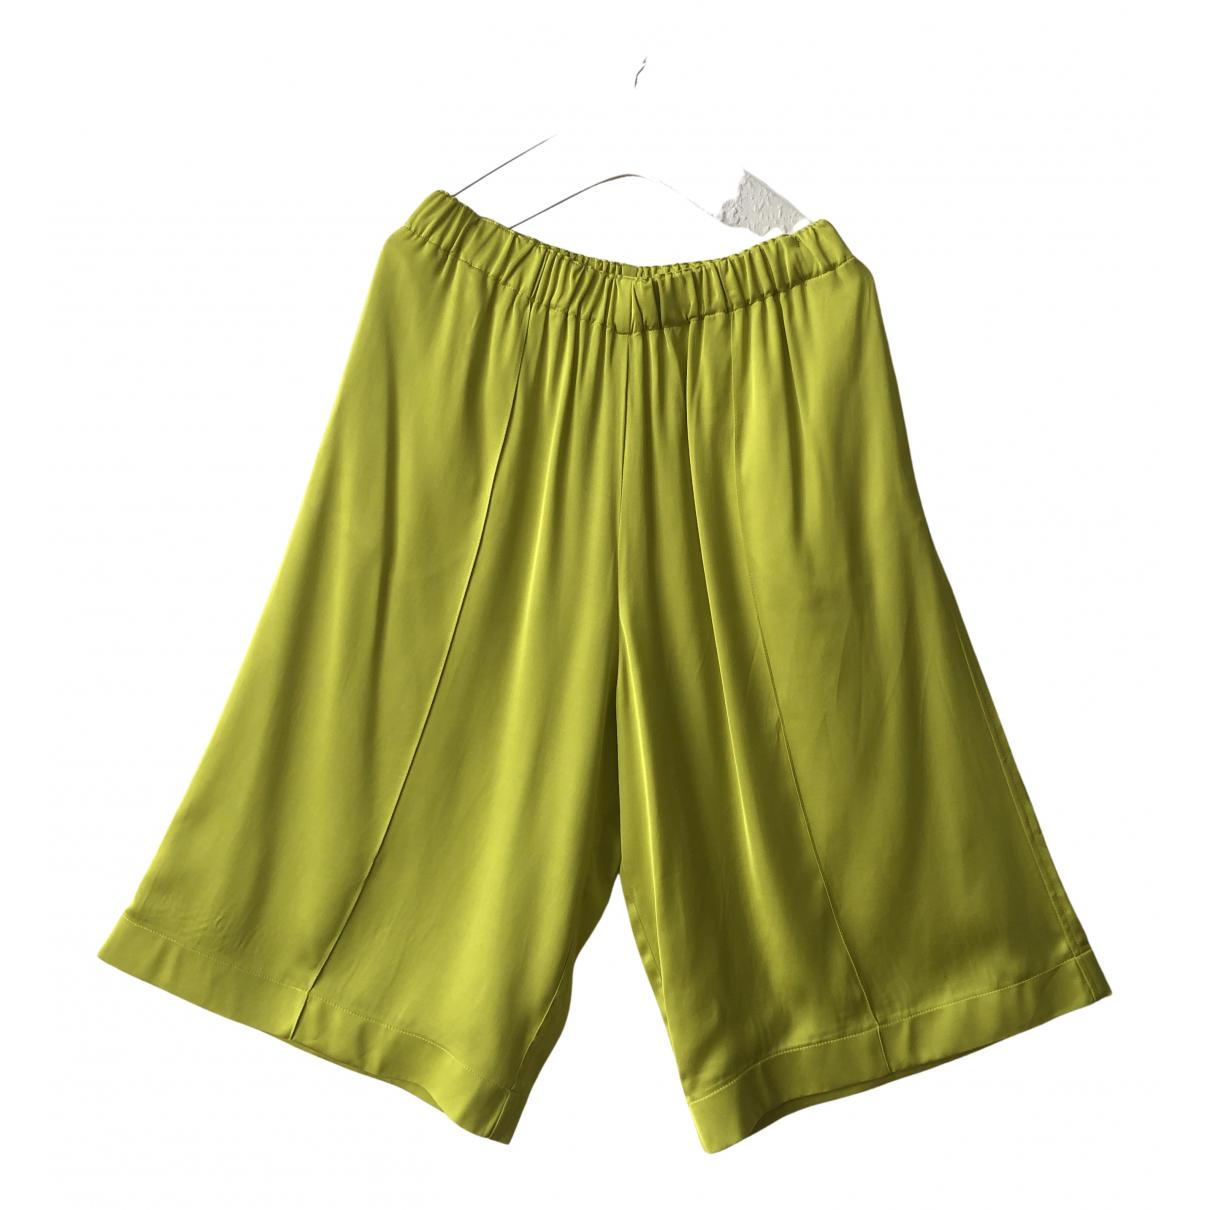 tophop N Green Shorts for Women 10 UK